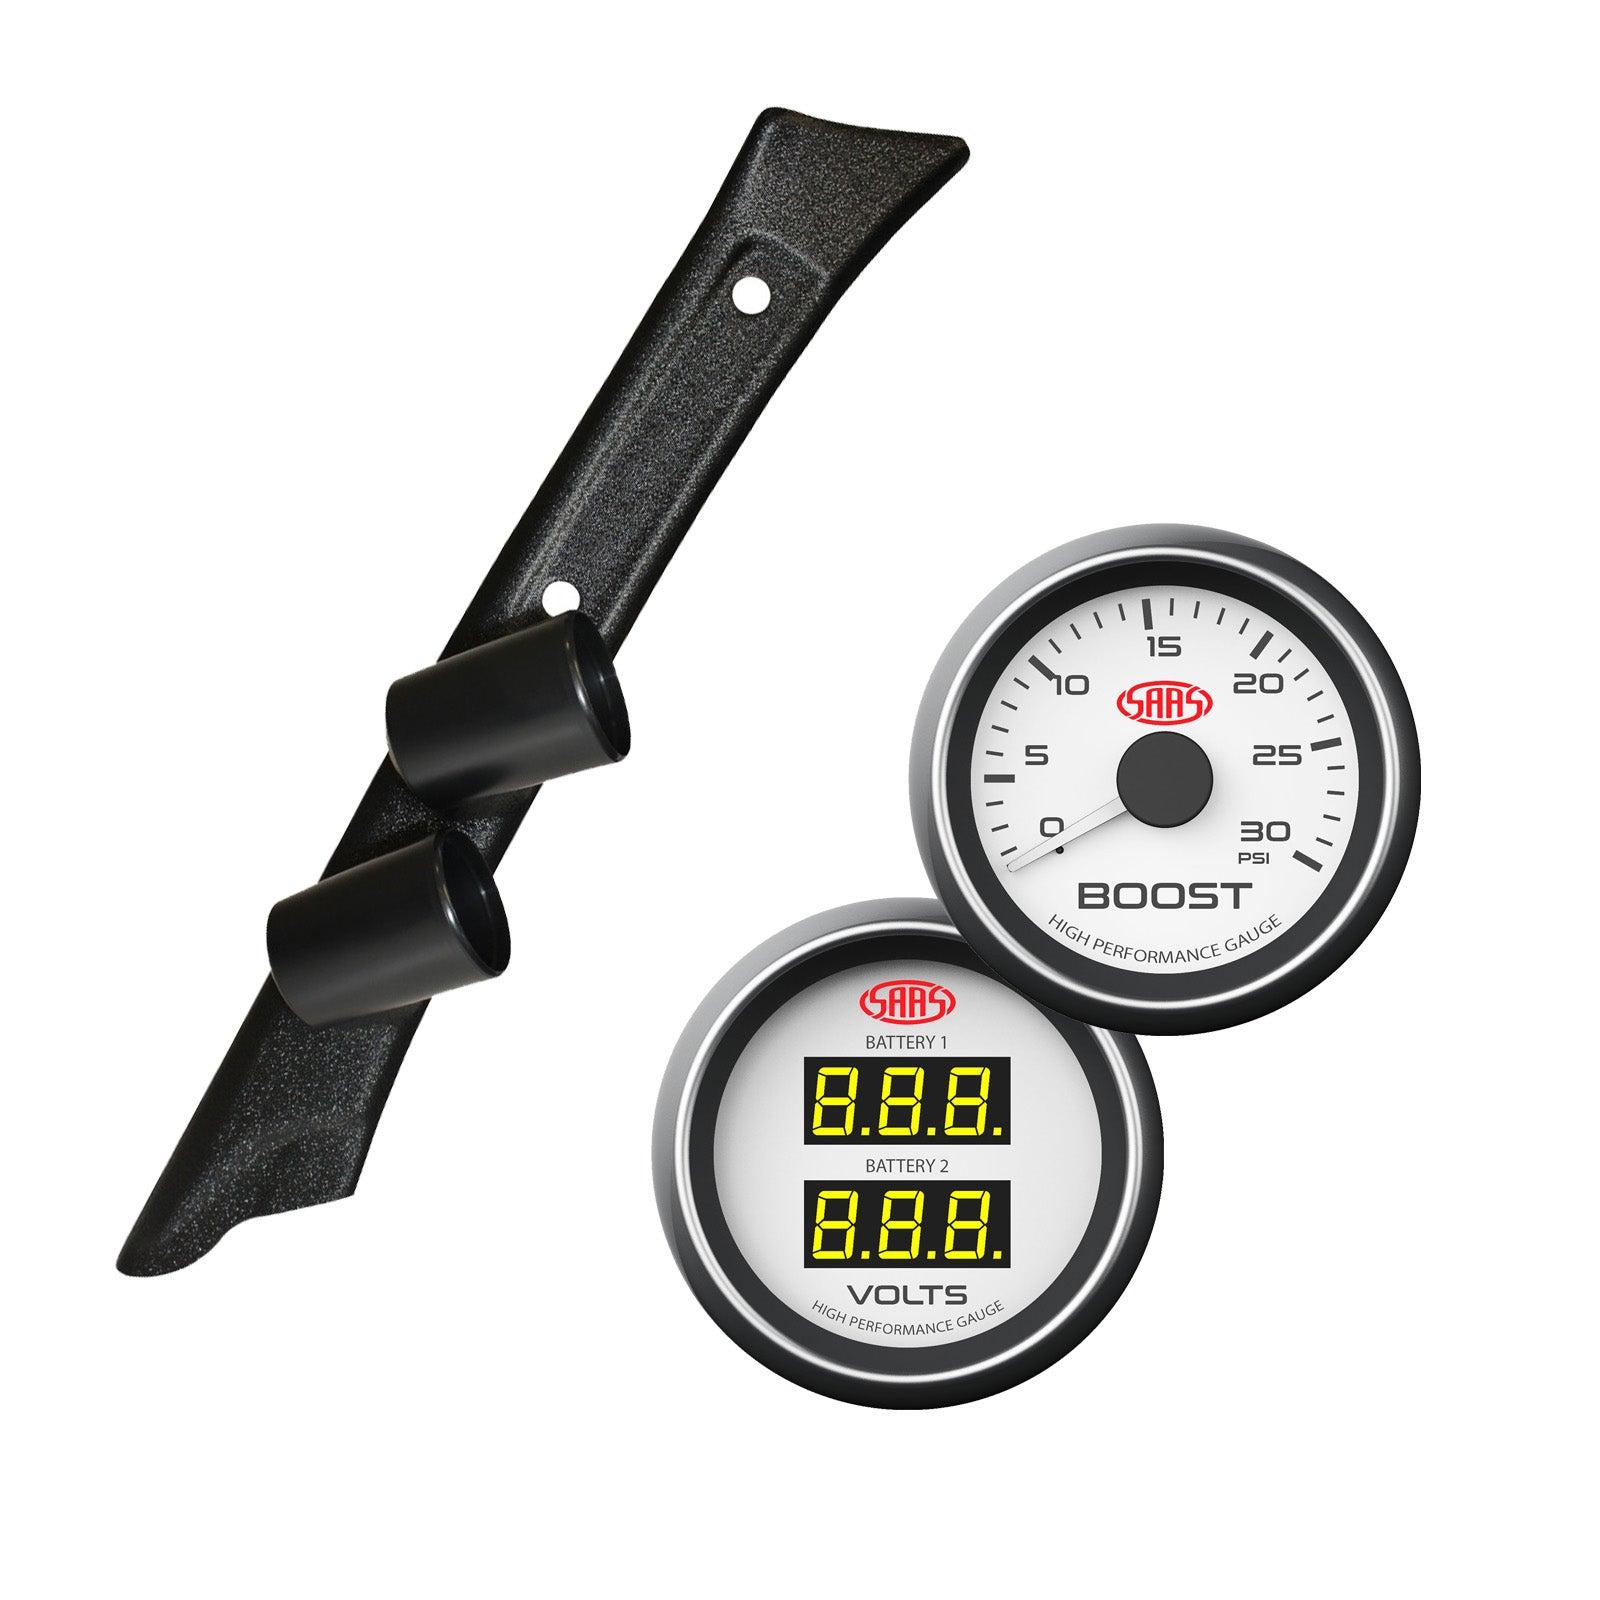 Pillar Pod w/ White Diesel Boost & Dual Volts Gauge for Landcruiser 80 1990-1998